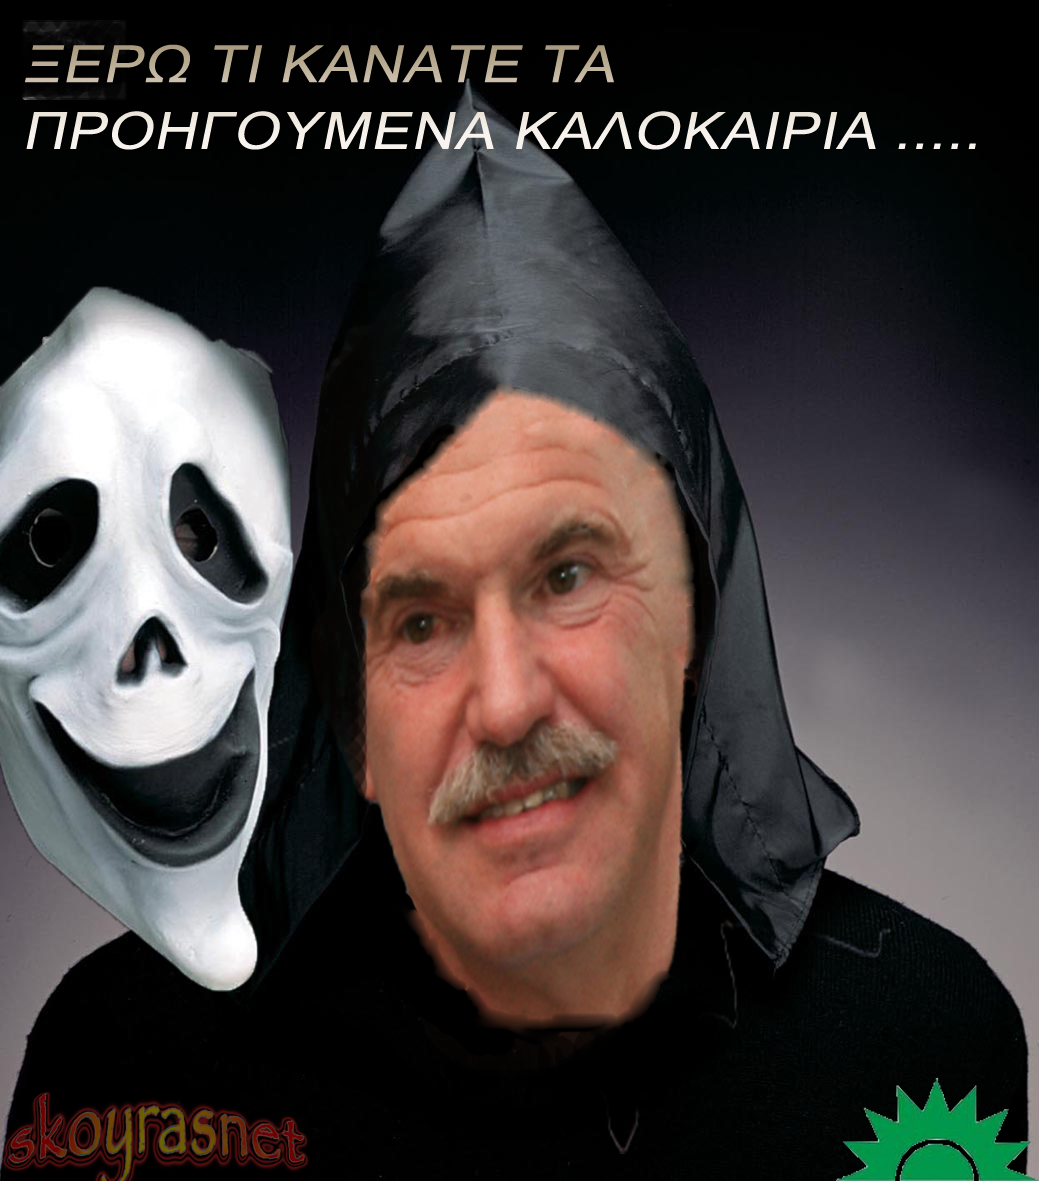 http://3.bp.blogspot.com/_L4AsdMp1ZtM/TURu_31dwUI/AAAAAAAAATE/9FEHDRLRtqk/s640/Gid-Hooded-Funny-Ghost-Mask---Clowns-Comedy-Fancy-Dre+1ss.png